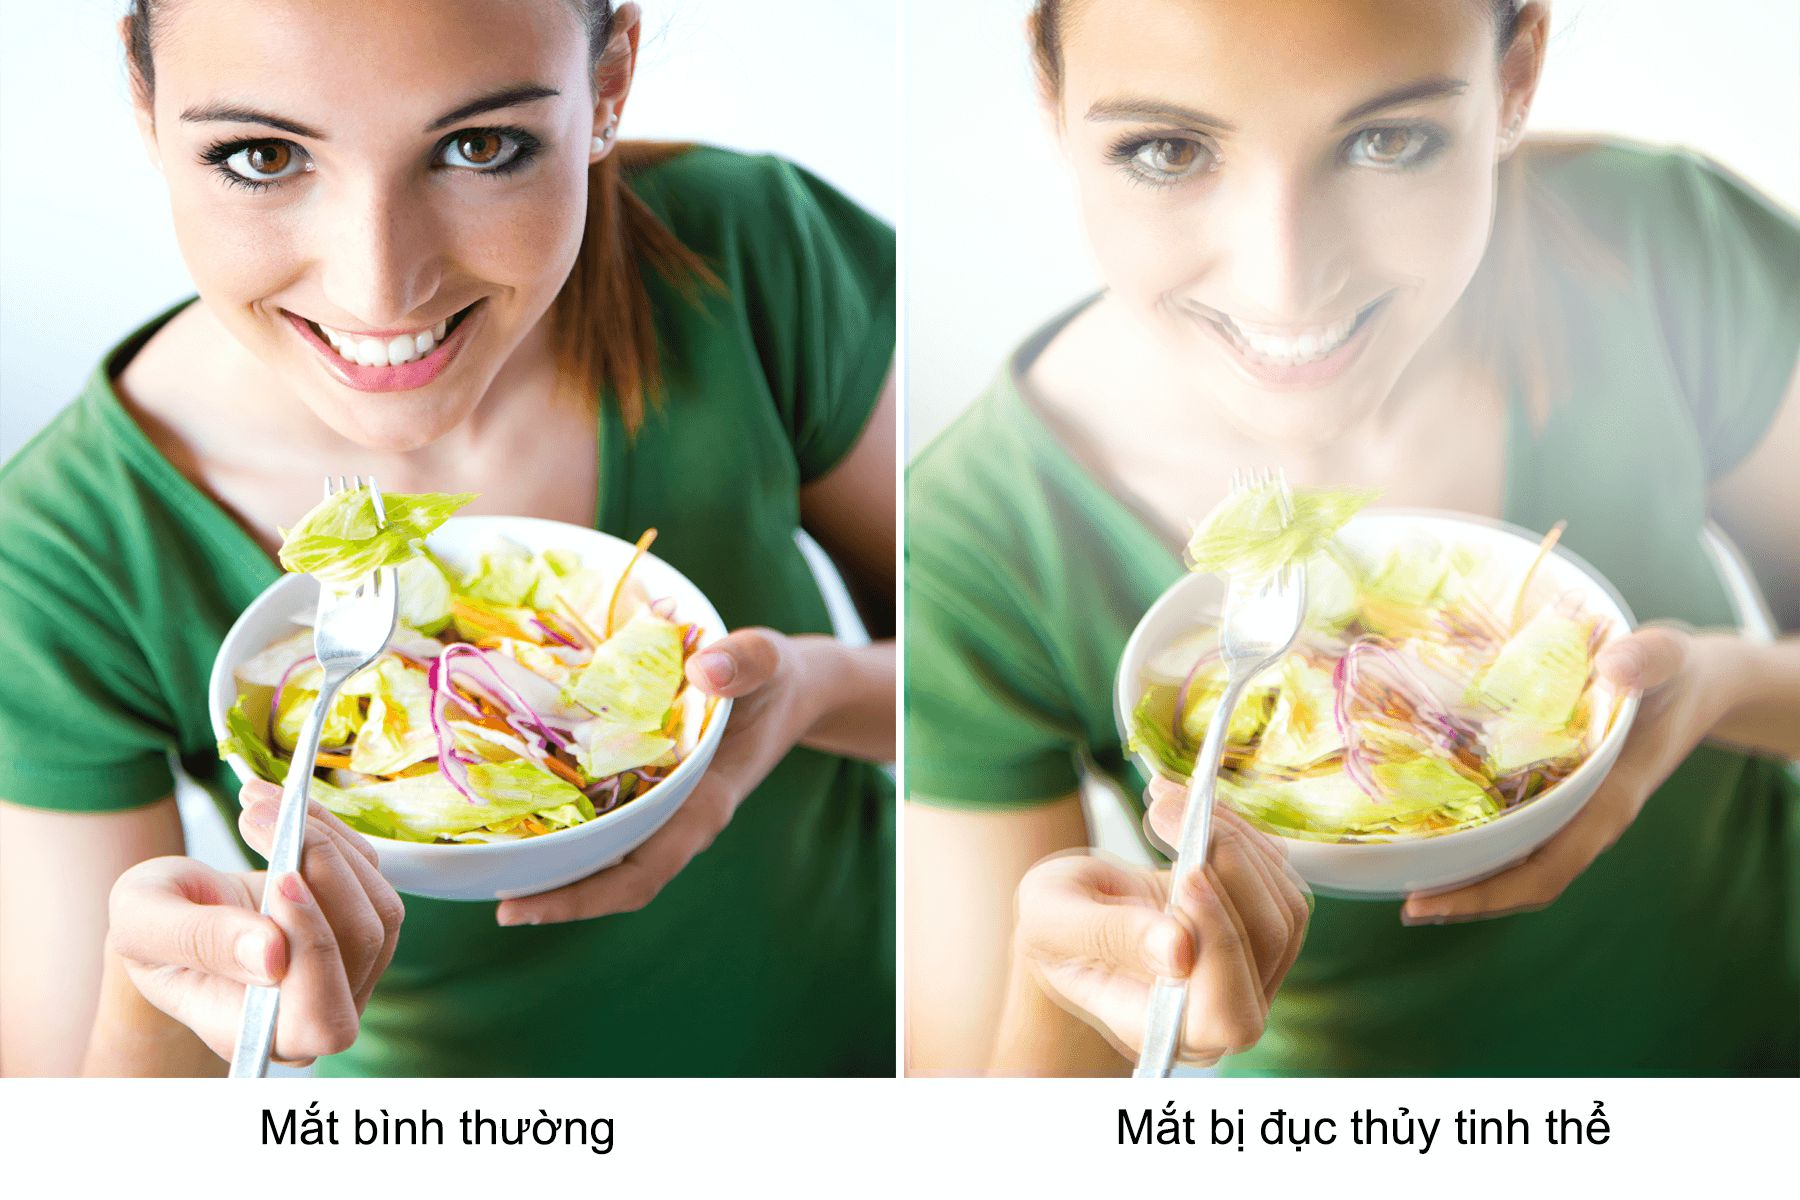 trieu-chung-duc-thuy-tinh-the